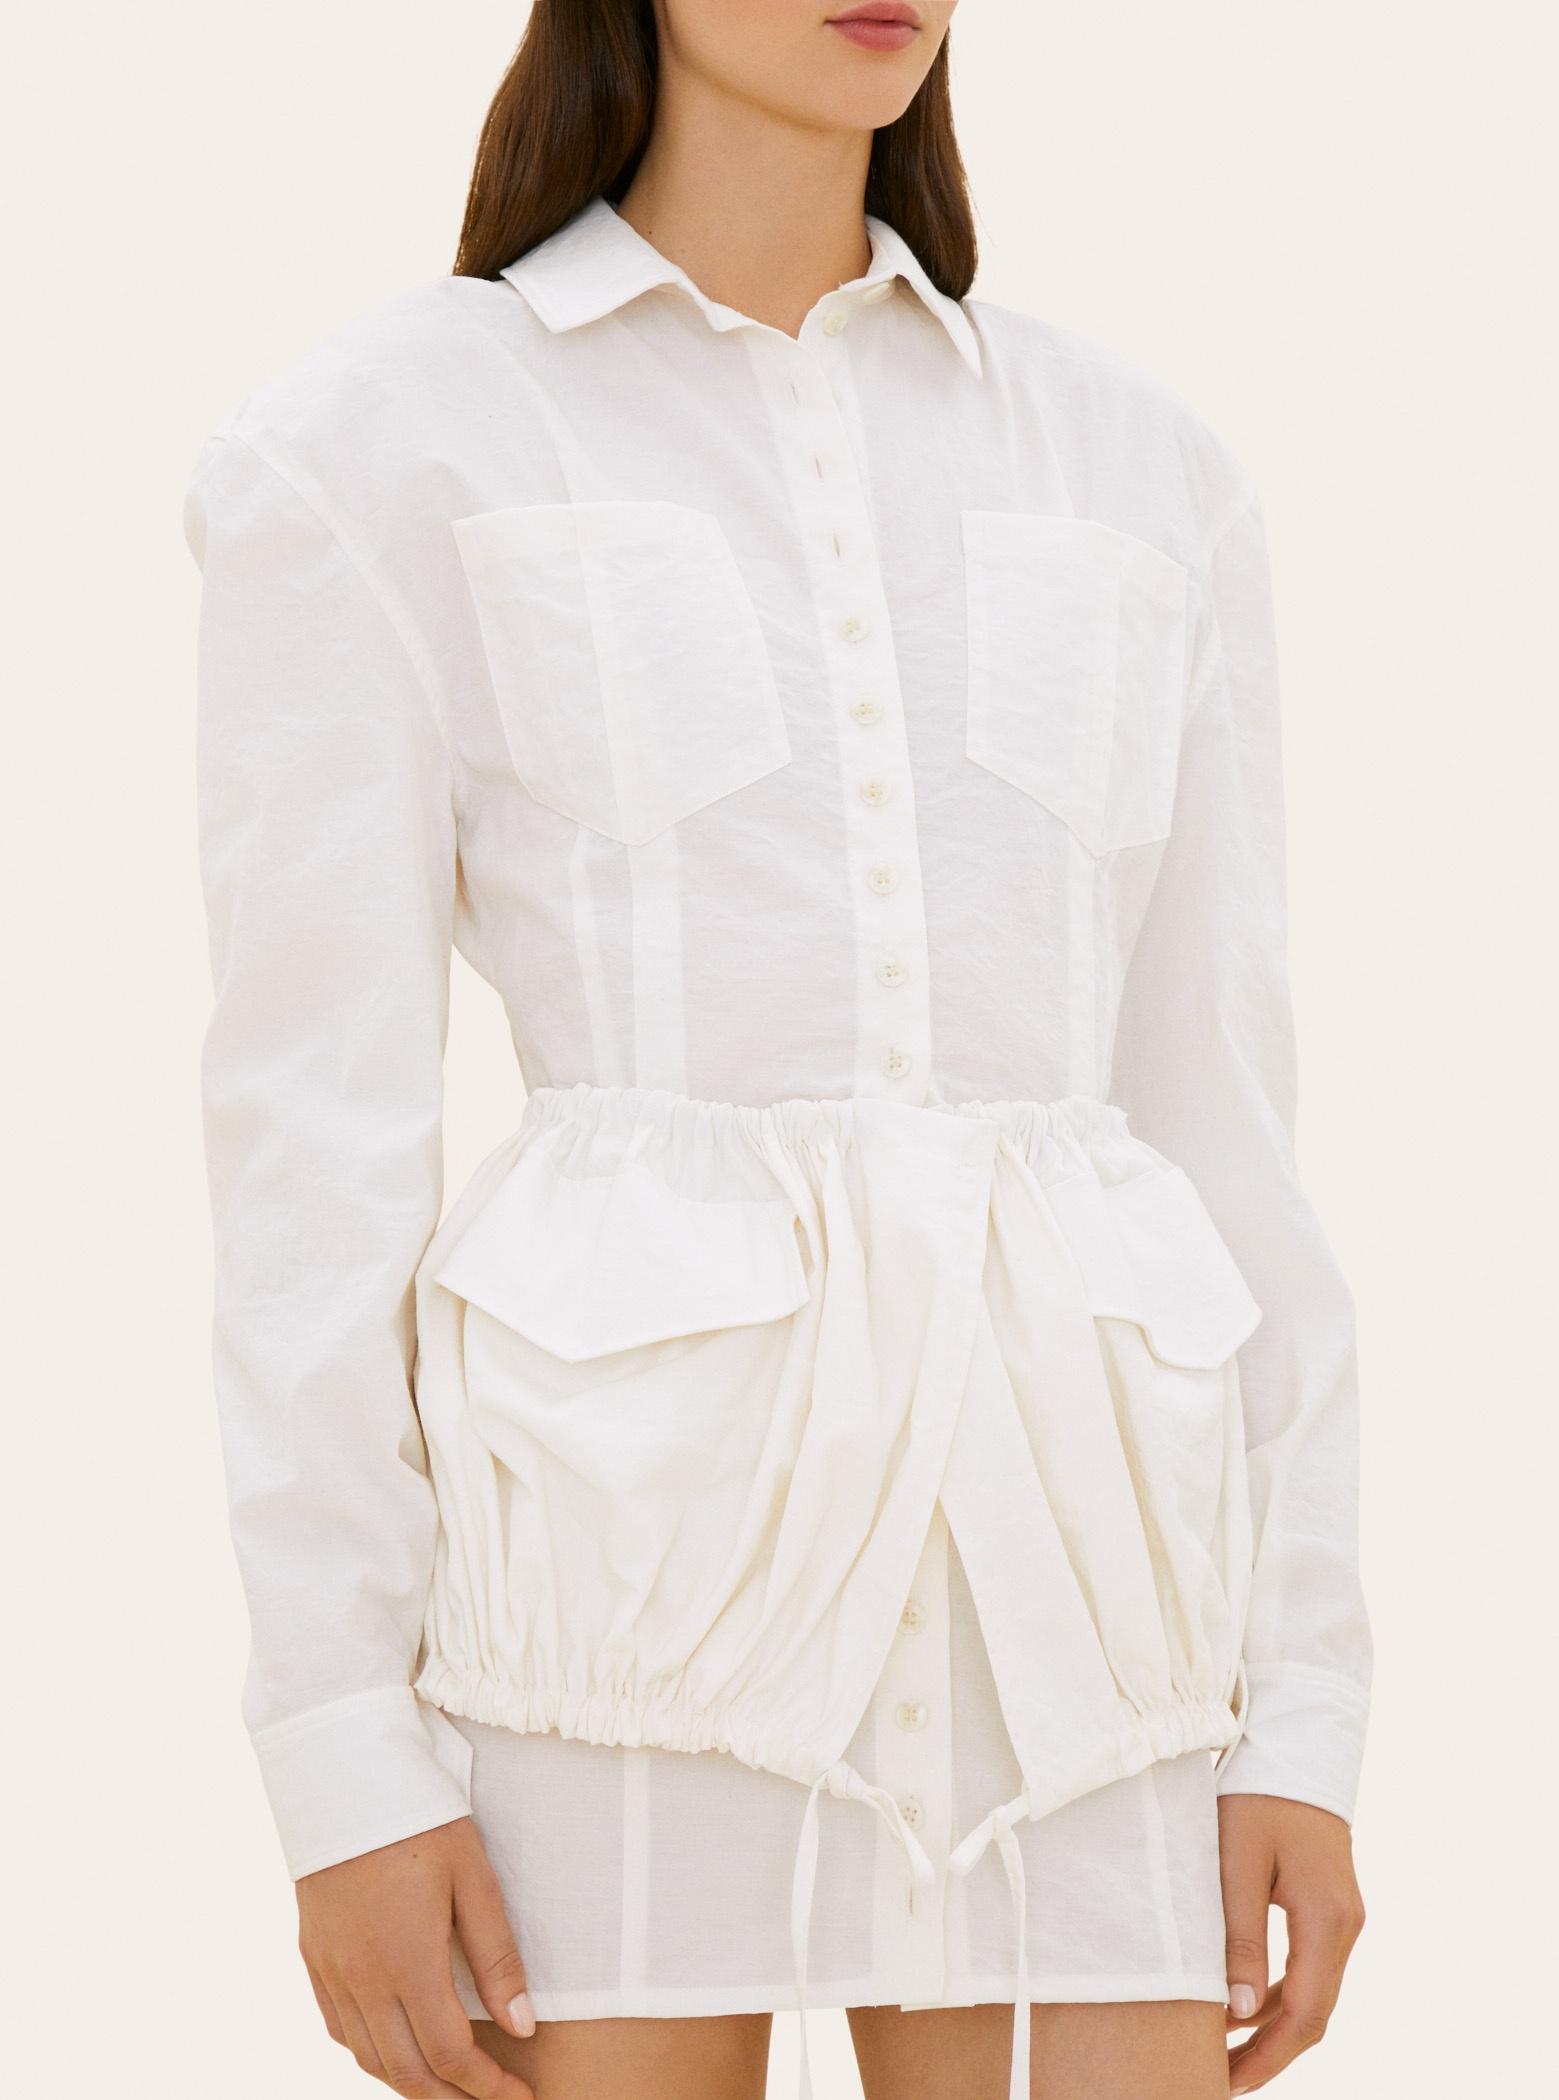 La robe Cueillette